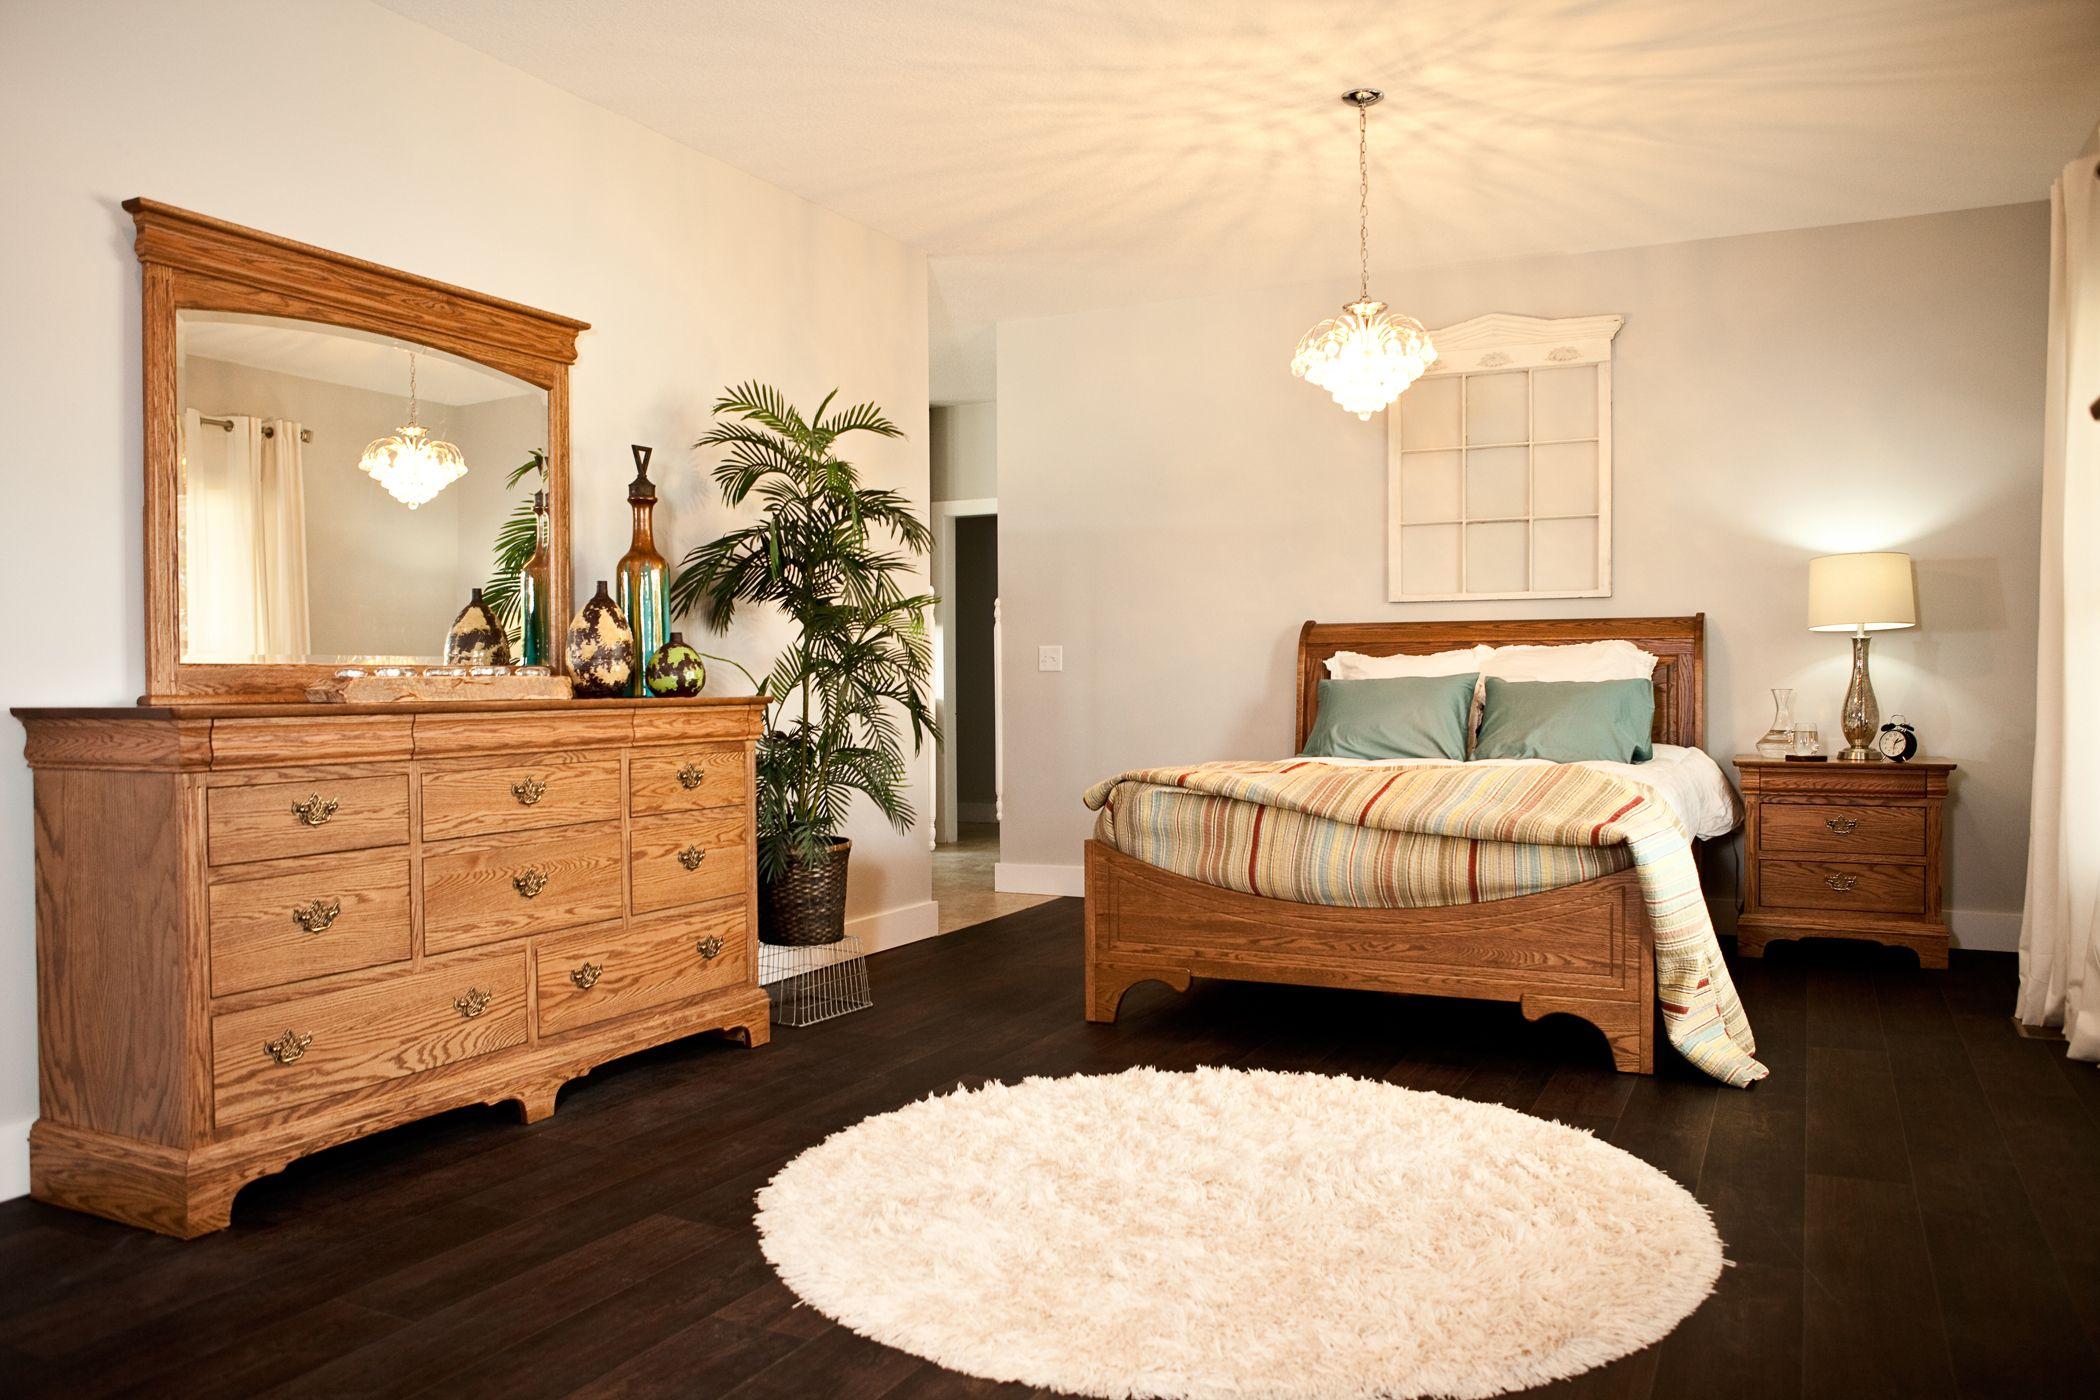 Edinburgh - Bedroom Set - EdinburghOakset from Oakwood | Bedroom ...